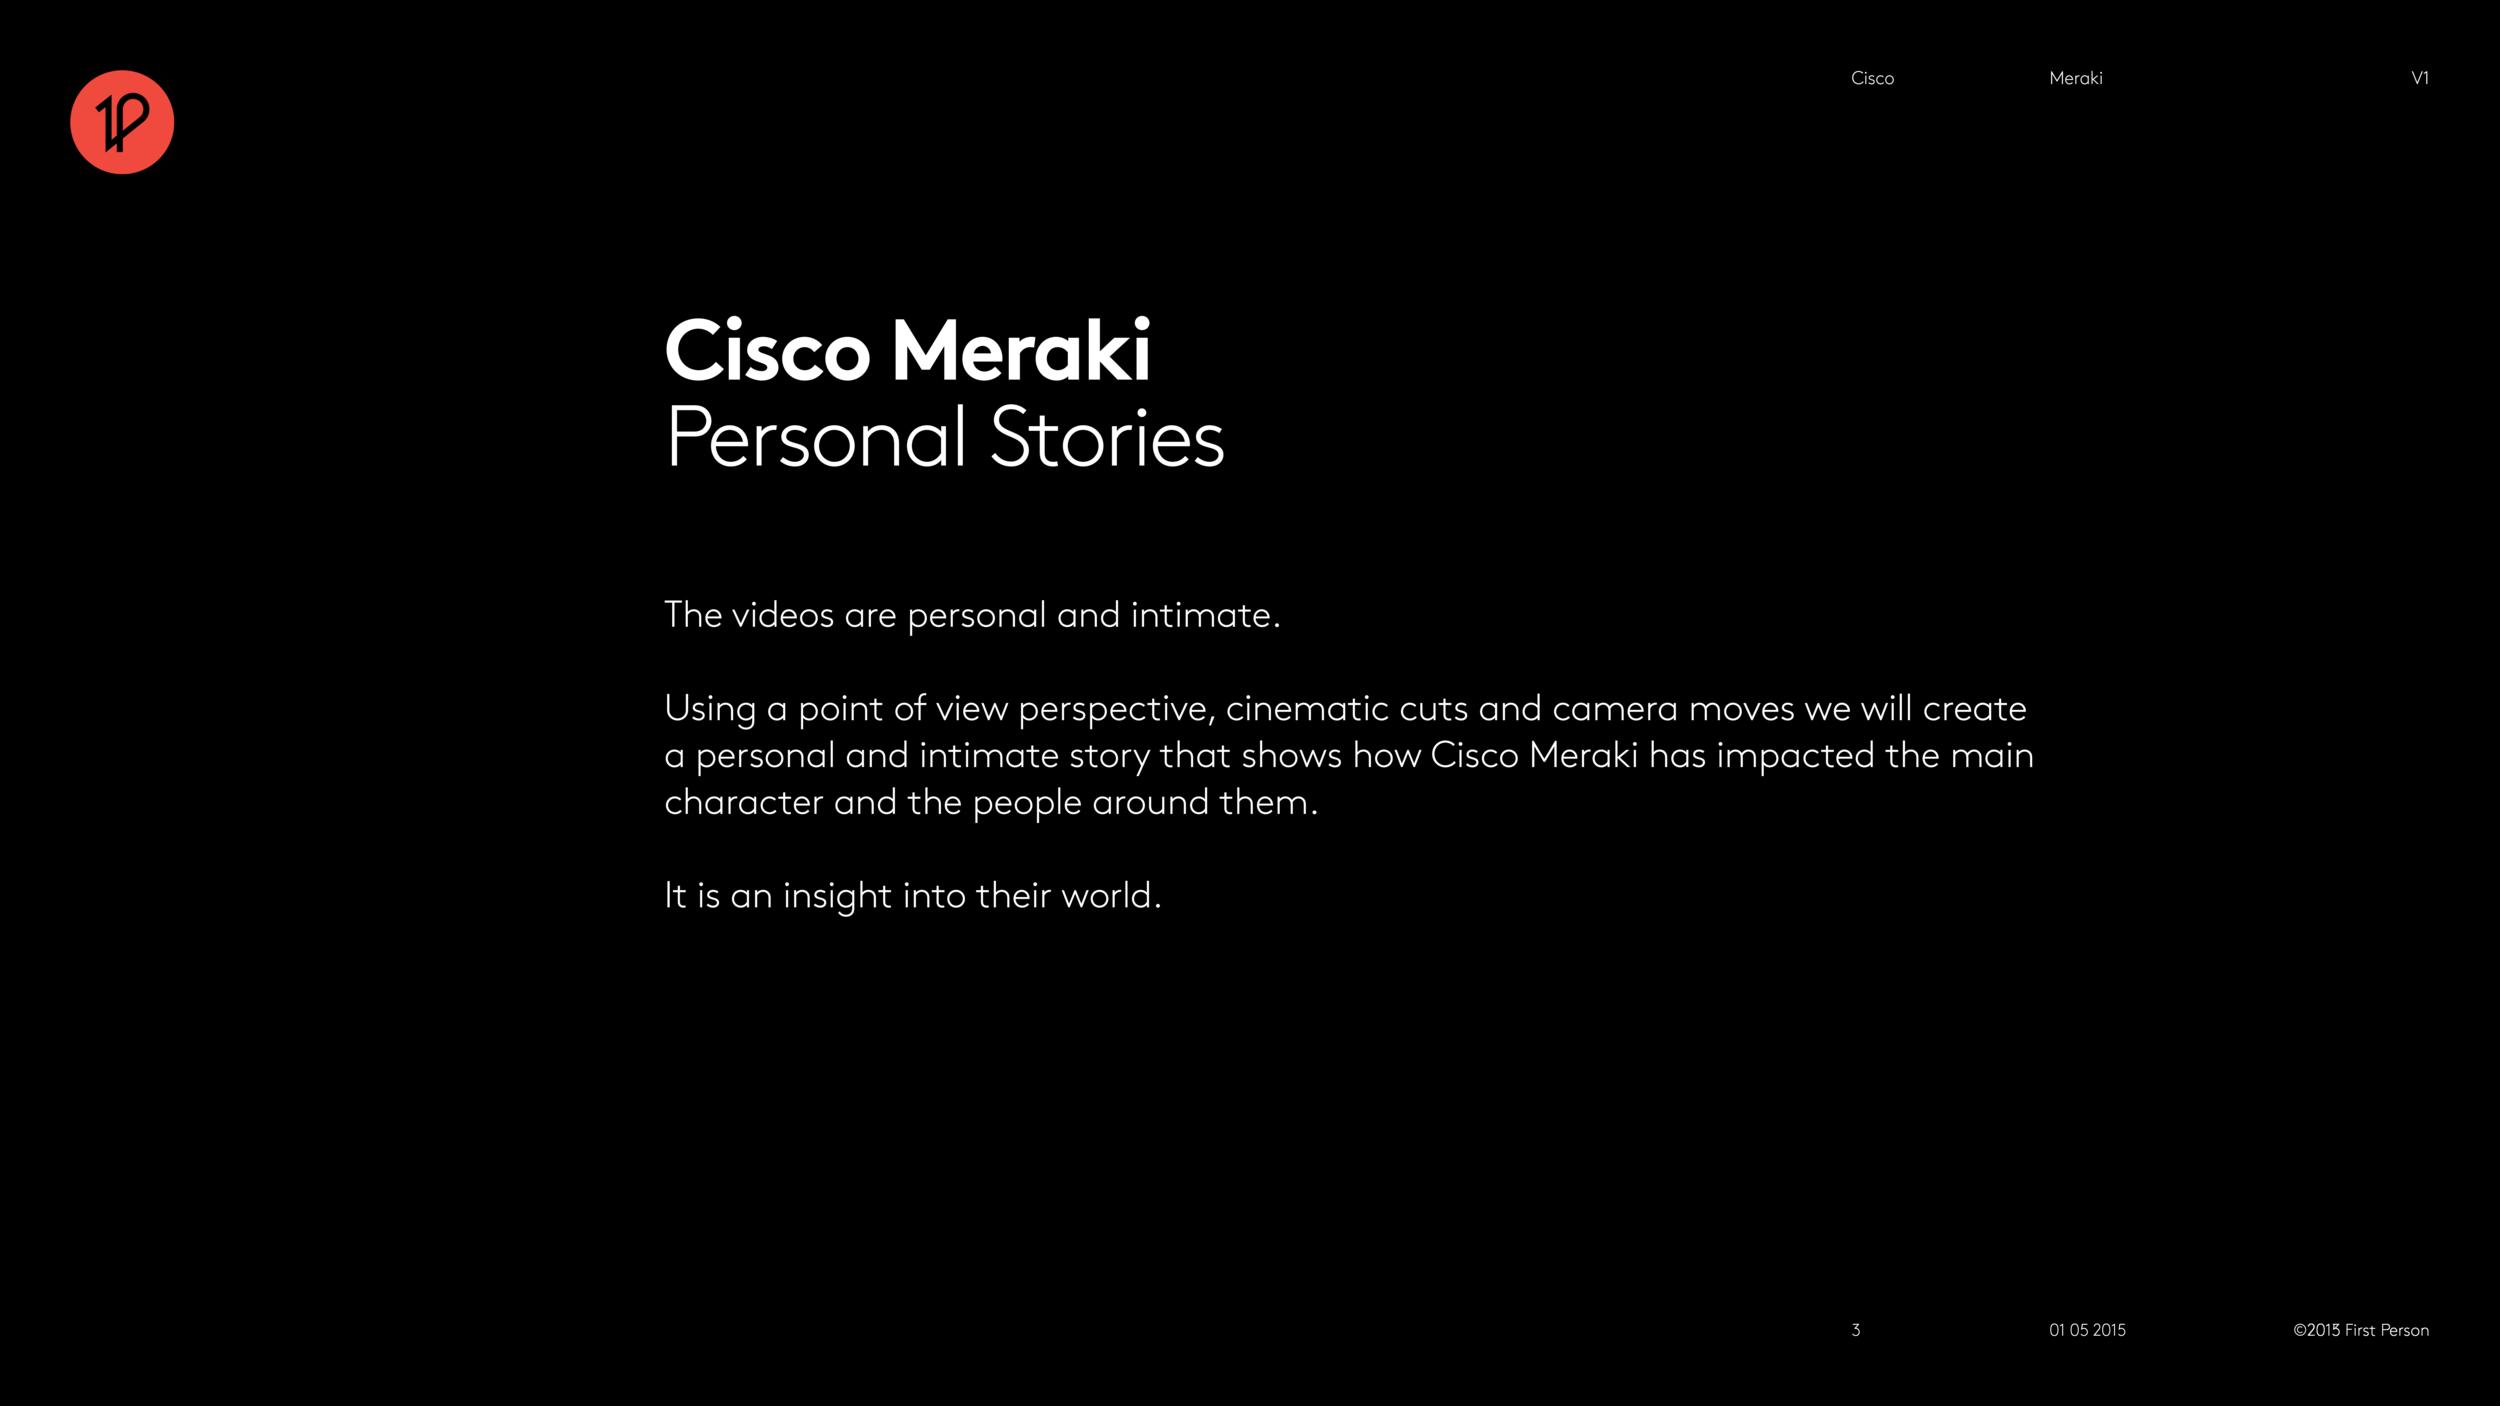 3431_CiscoMeraki_Storyboards_v01-3.png